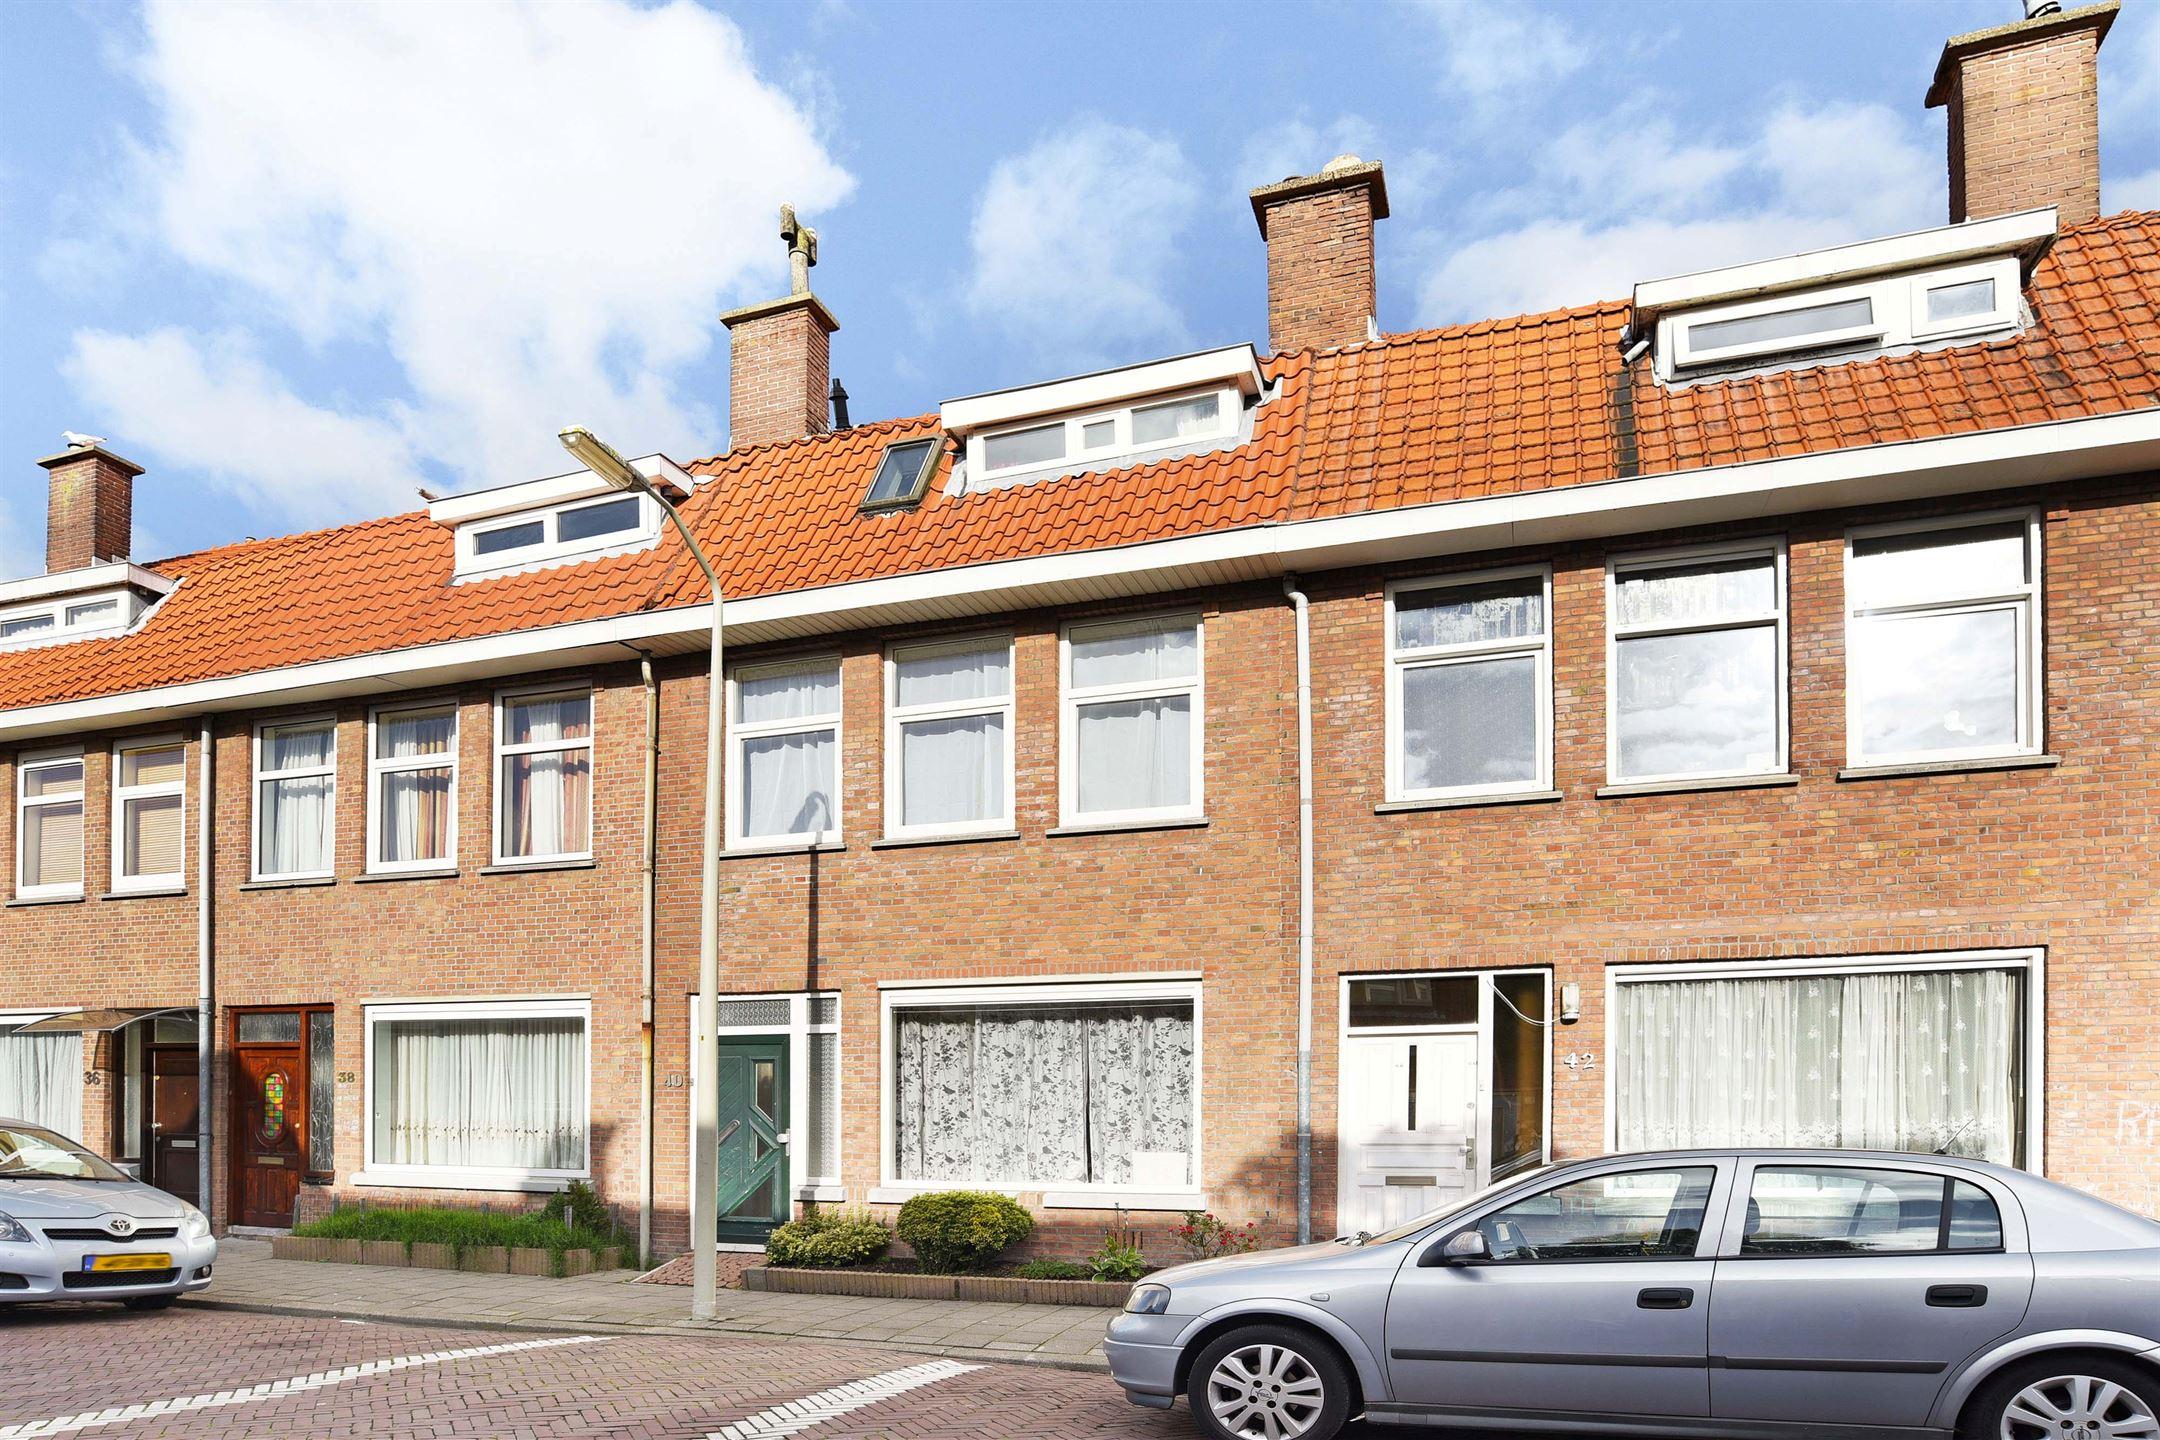 Verkocht van koetsveldstraat 40 2523 eh den haag funda for Eengezinswoning den haag